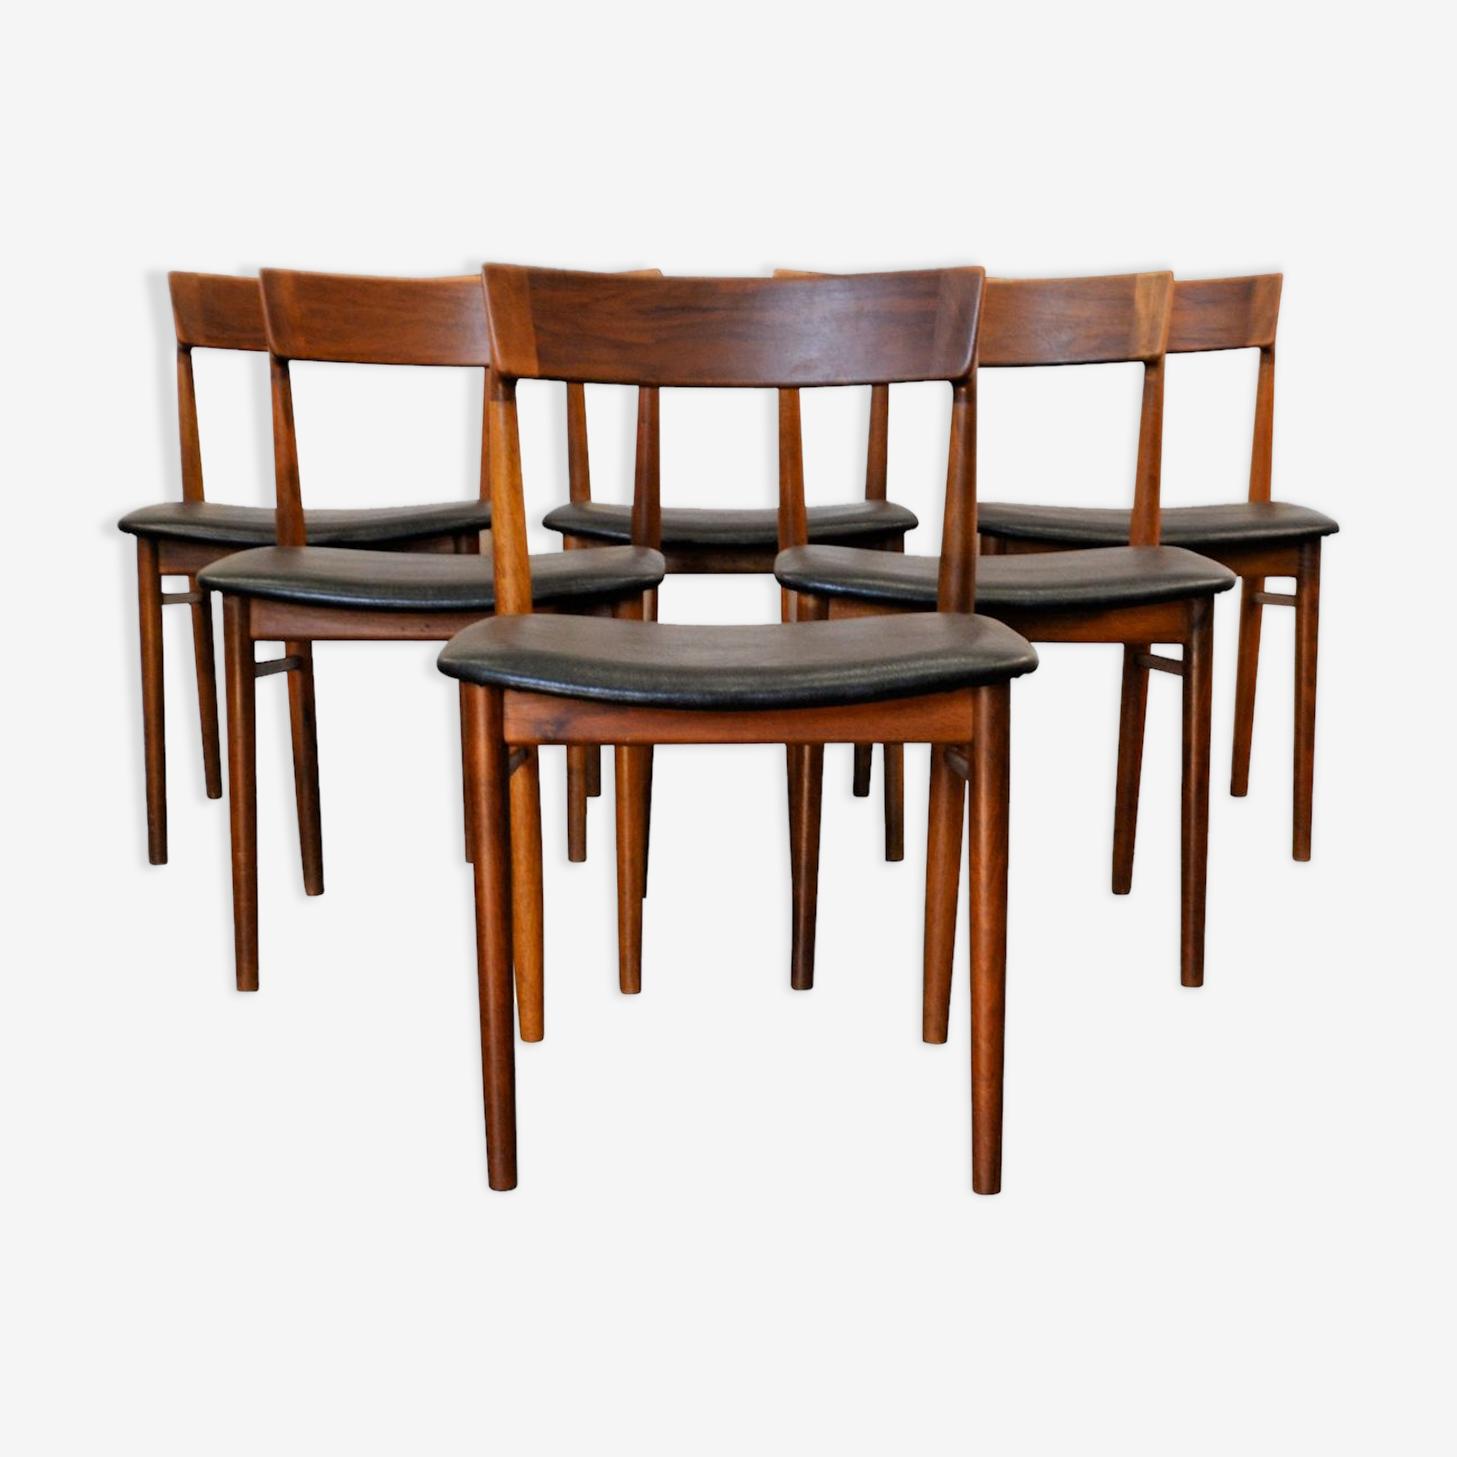 Set de 6 chaises en palissandre vintage Henry Rosengren